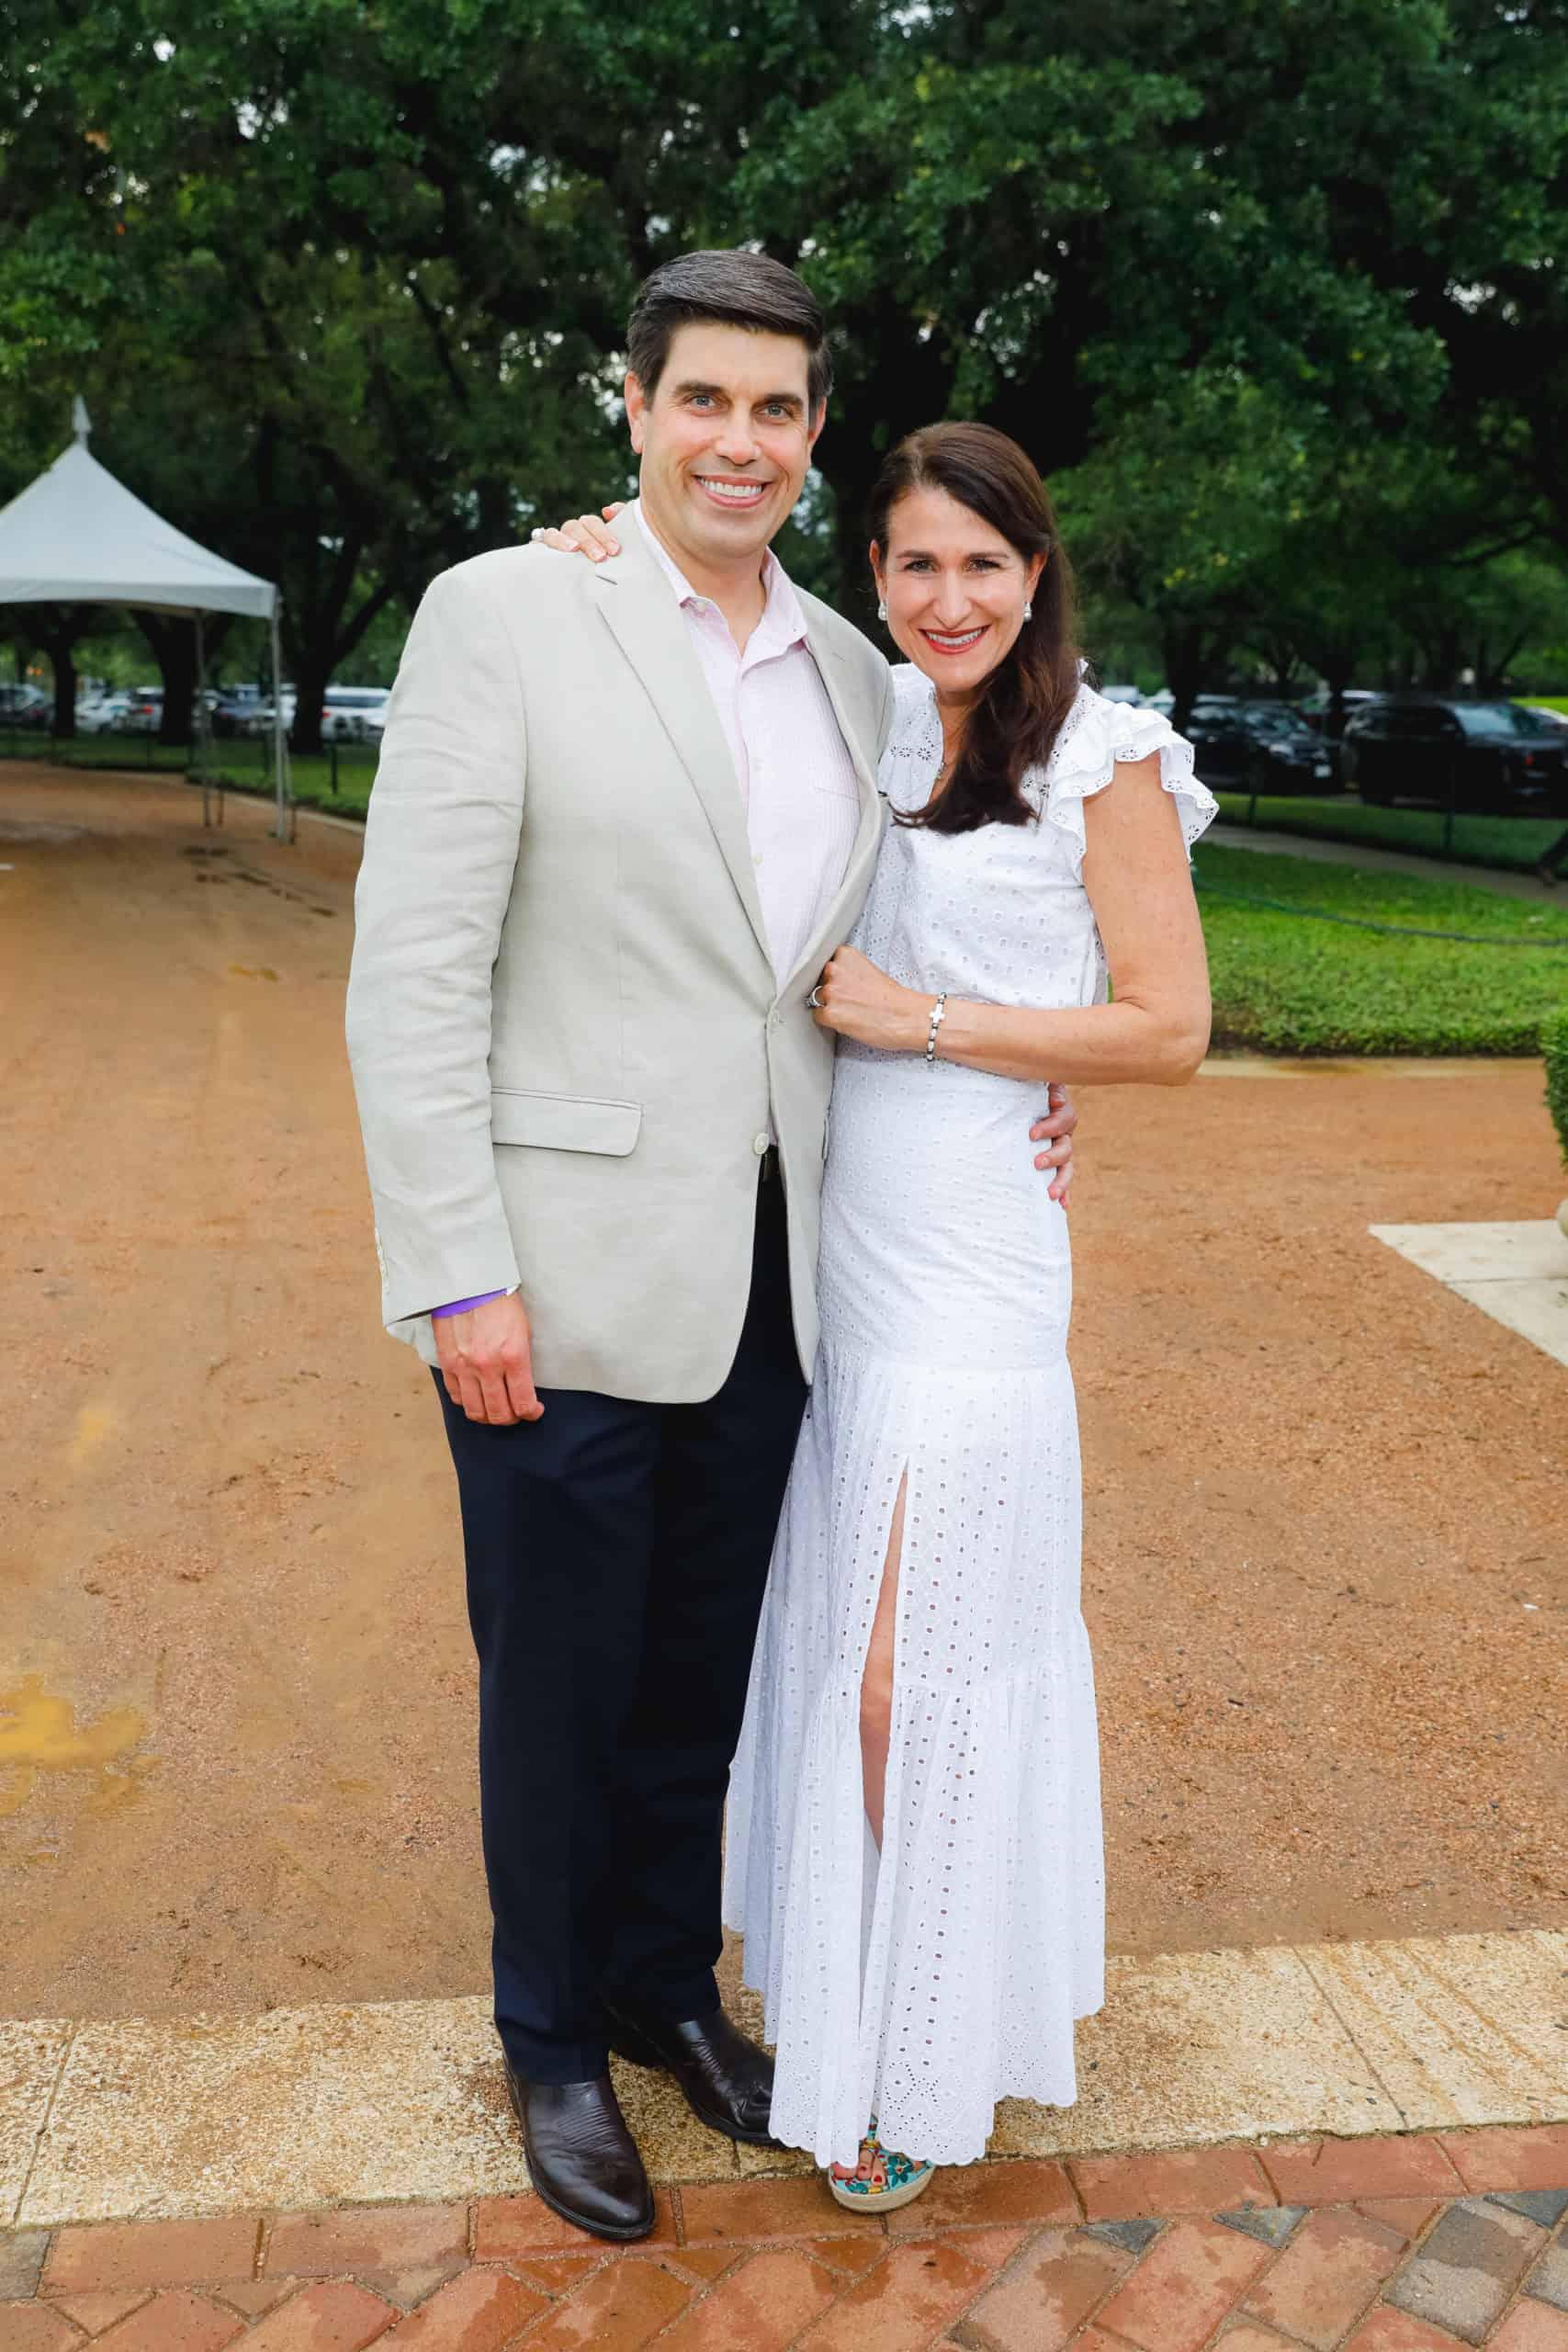 John and Kristen Berger